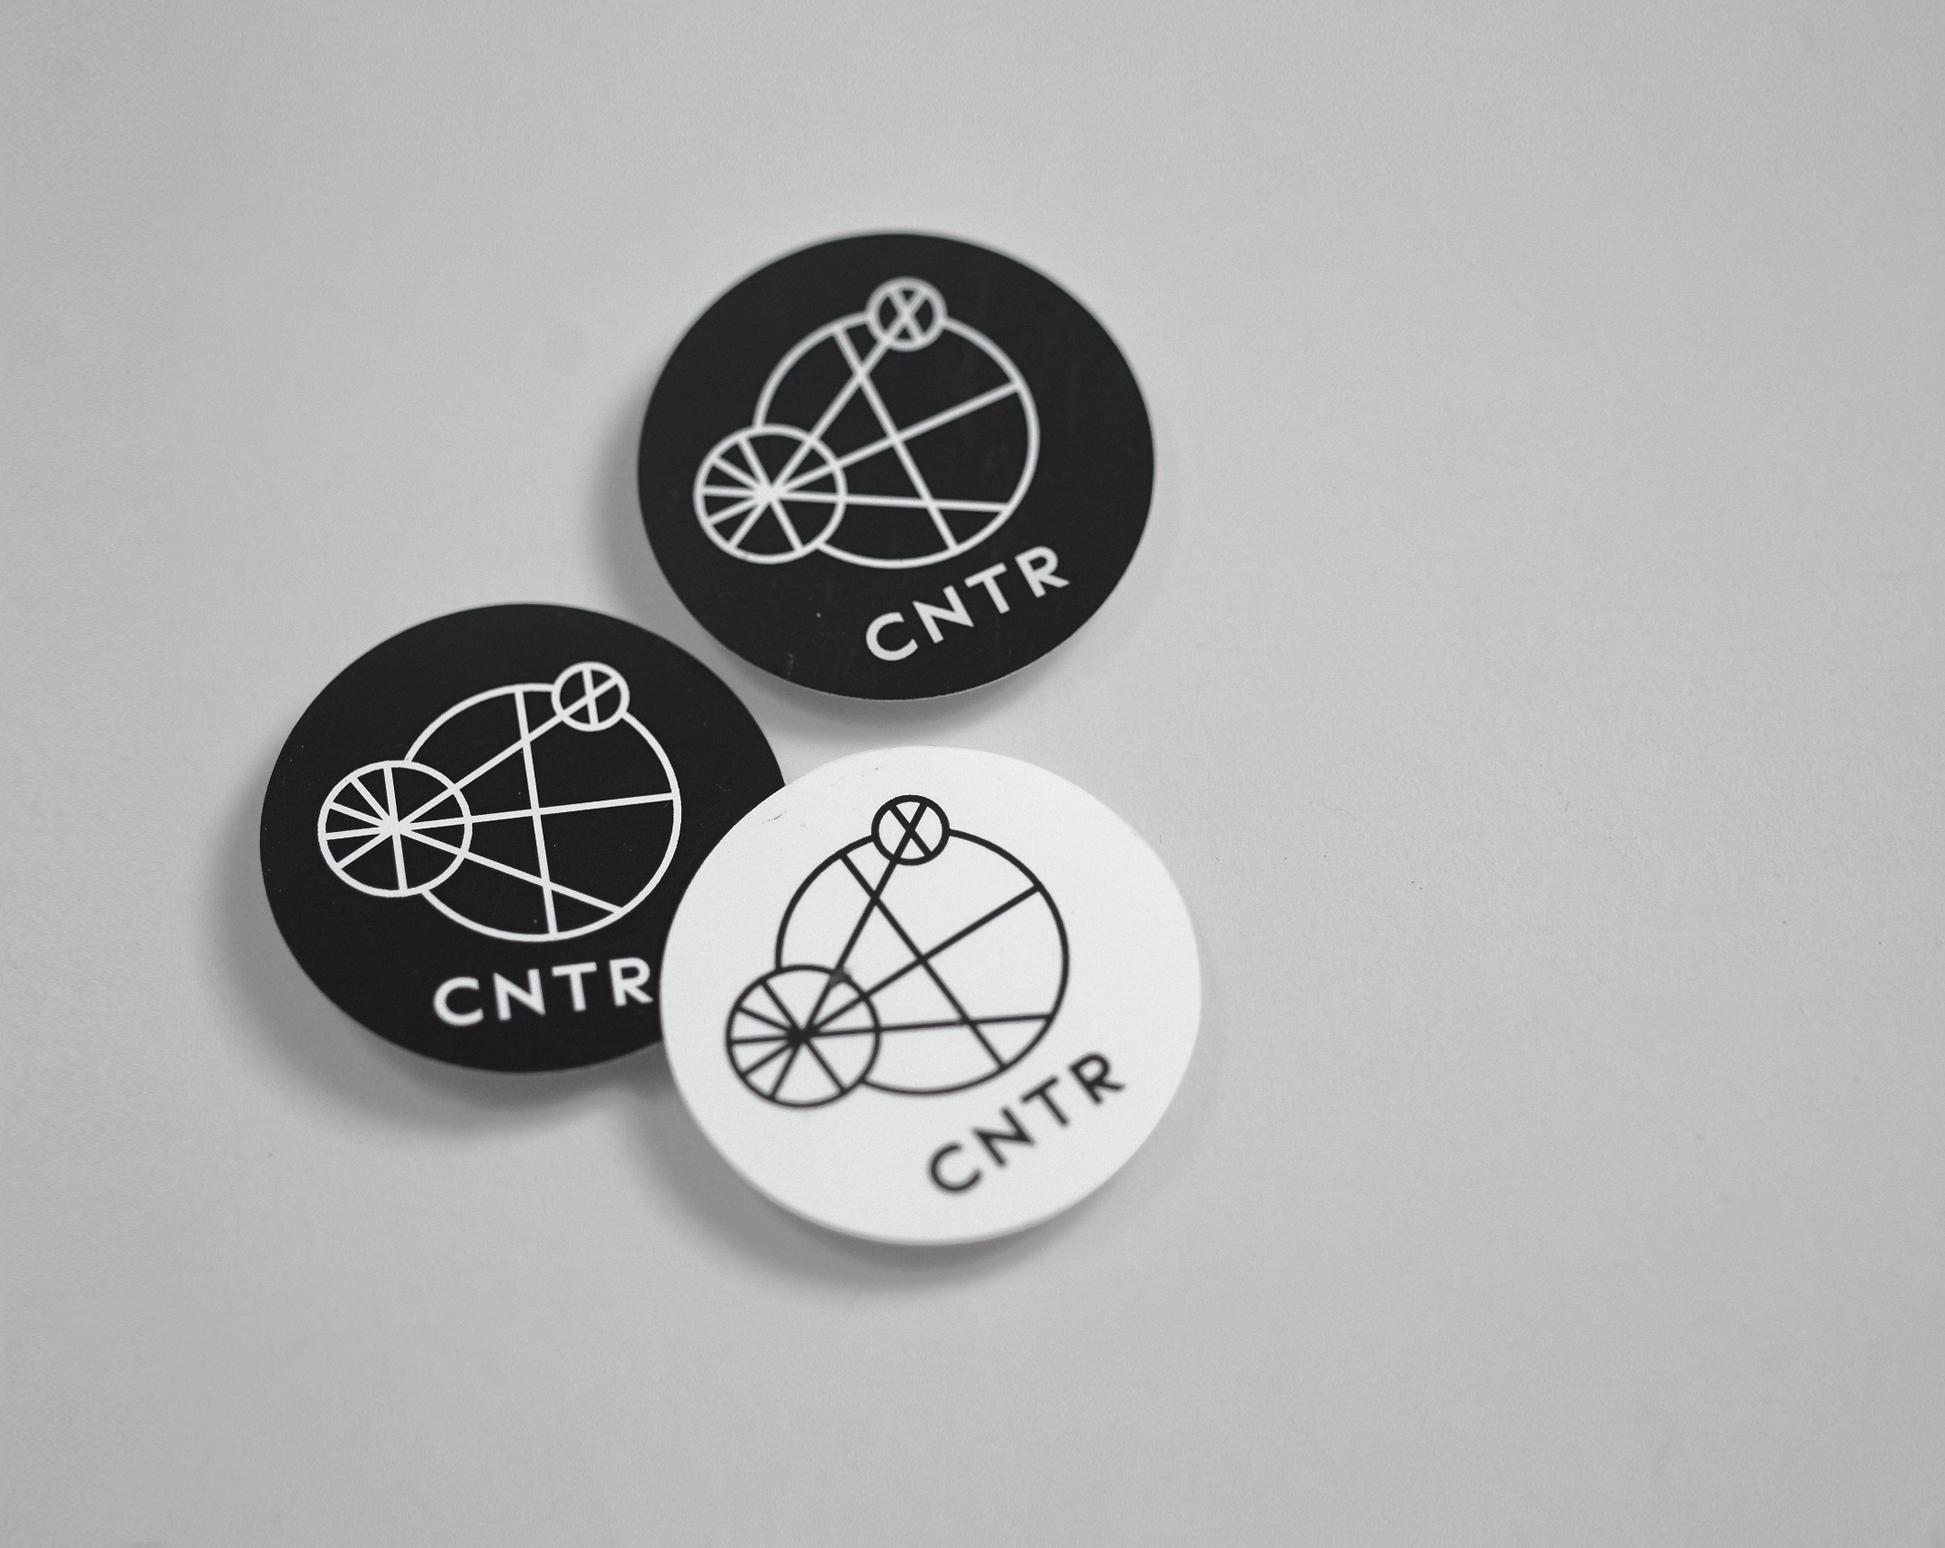 cntr_3.jpg